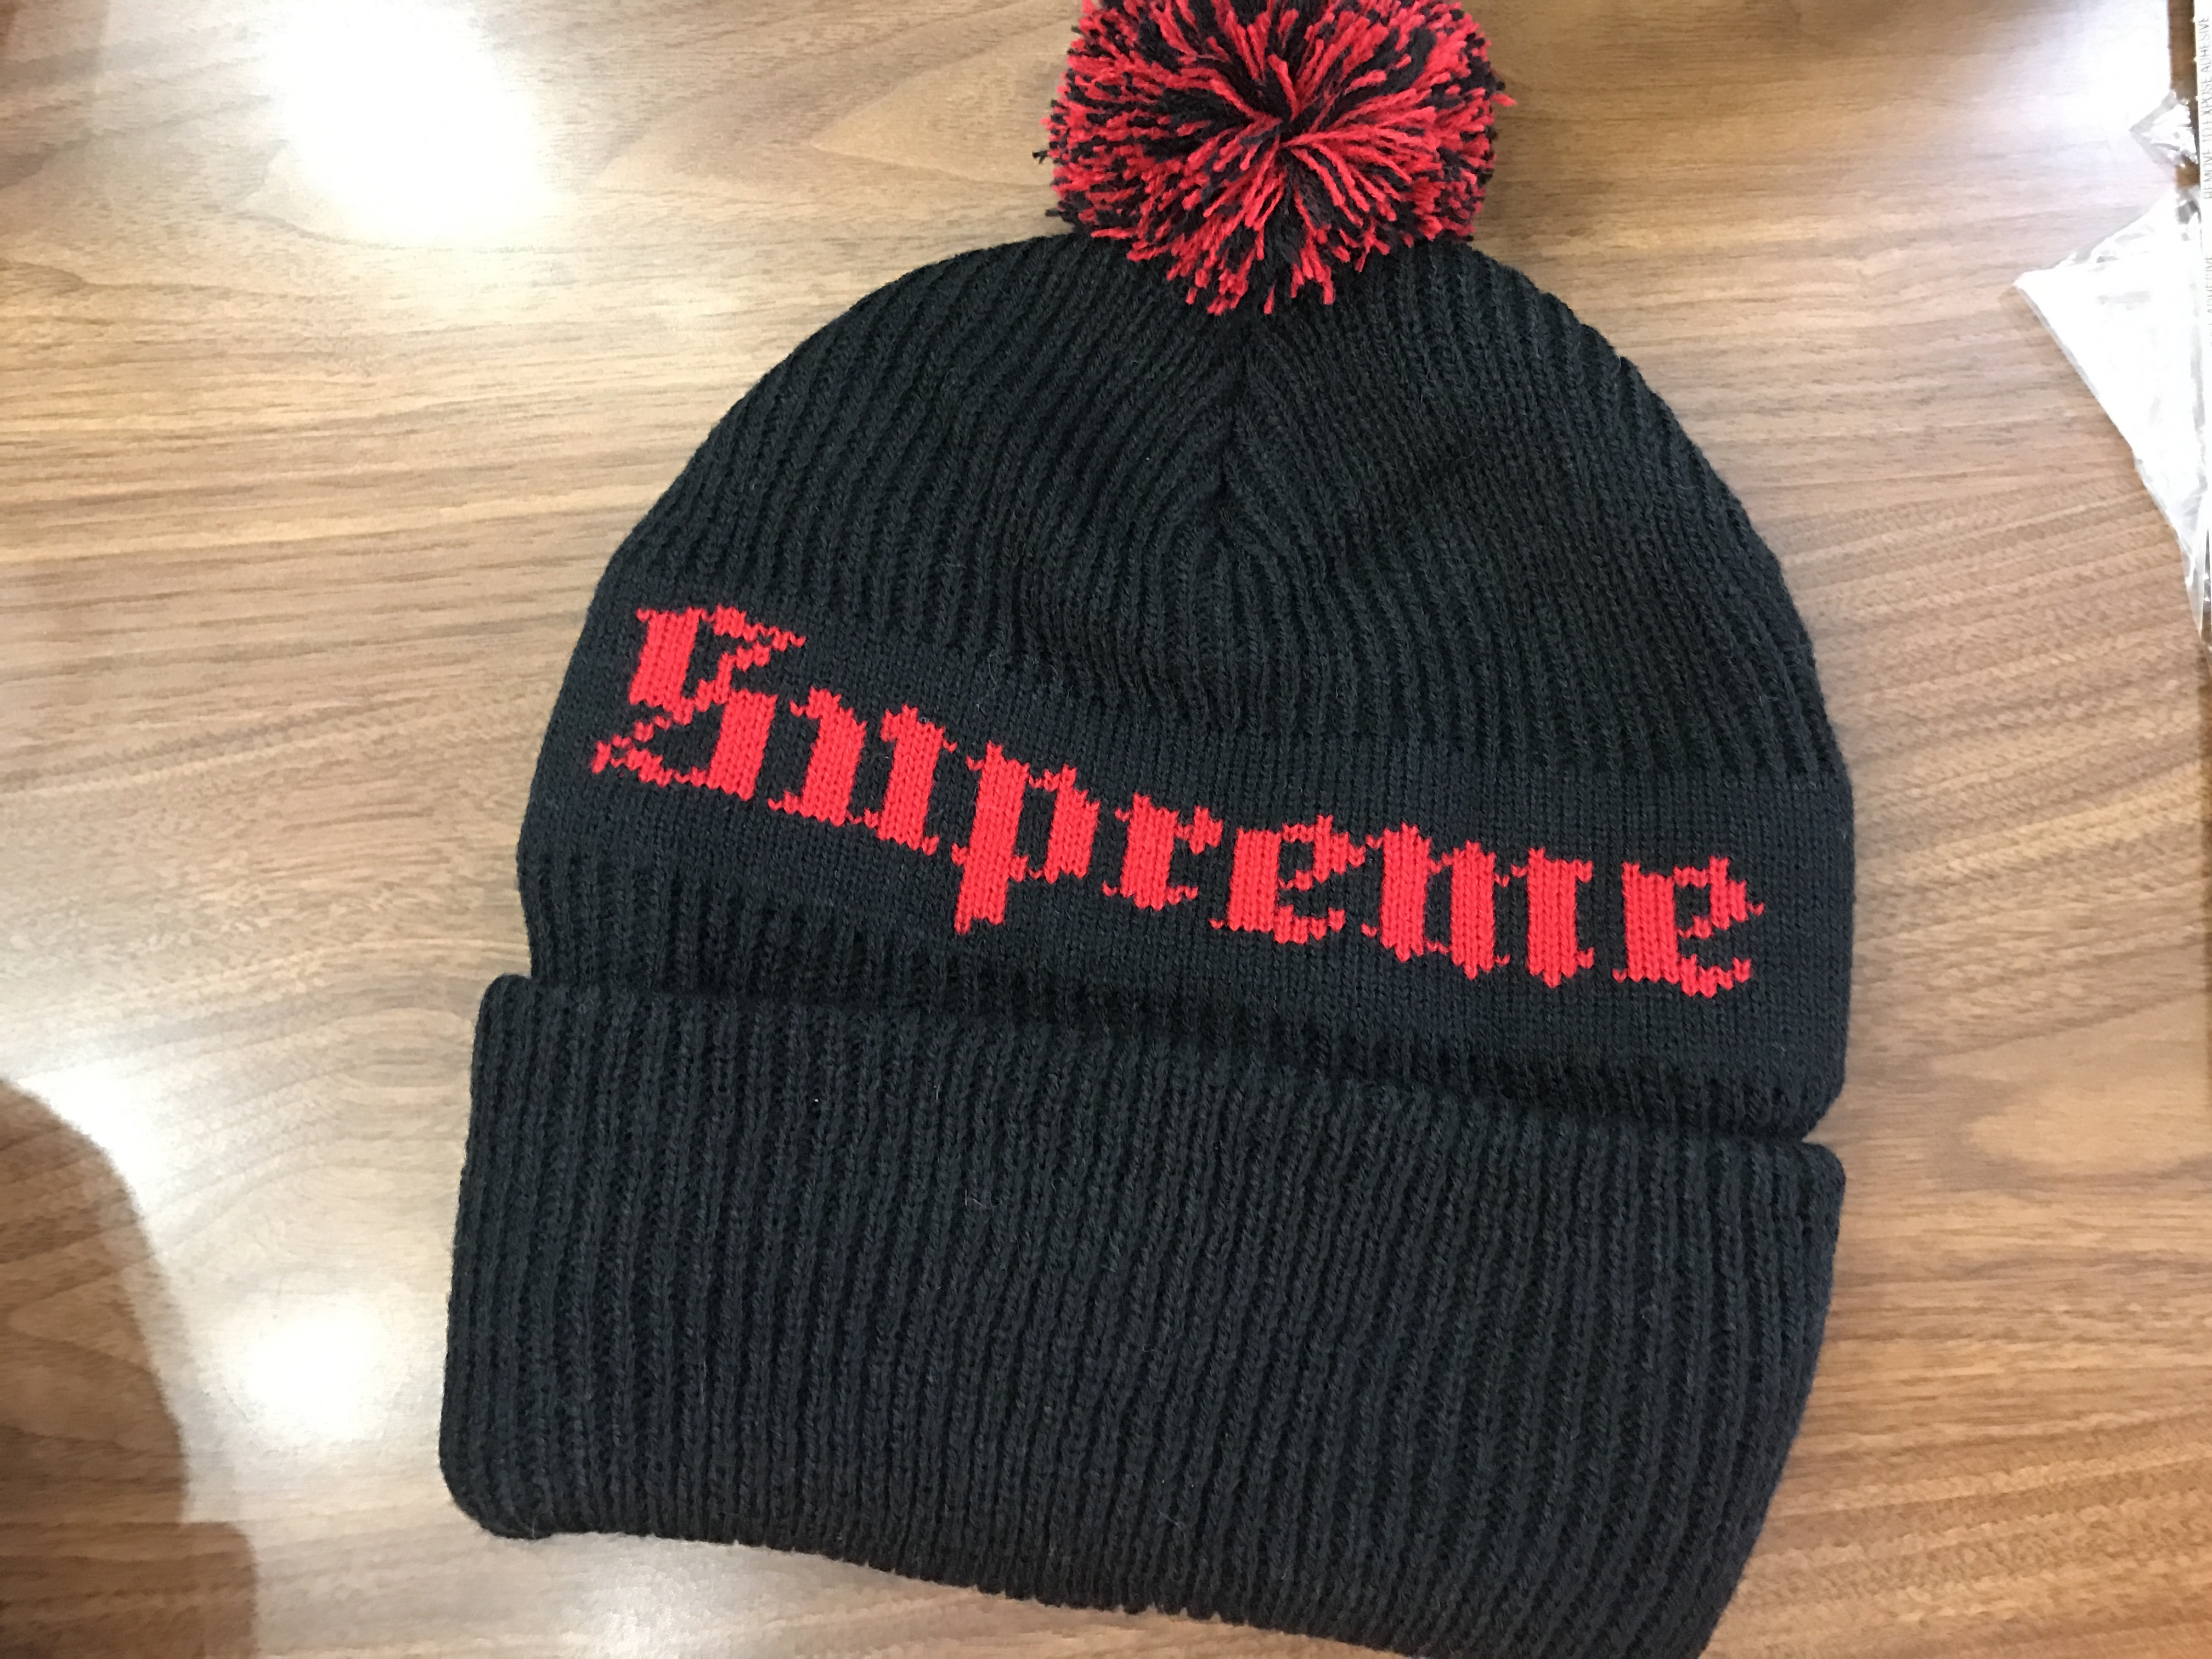 0f6dde24 Supreme Brand New Supreme Old English Beanie - Black | Grailed